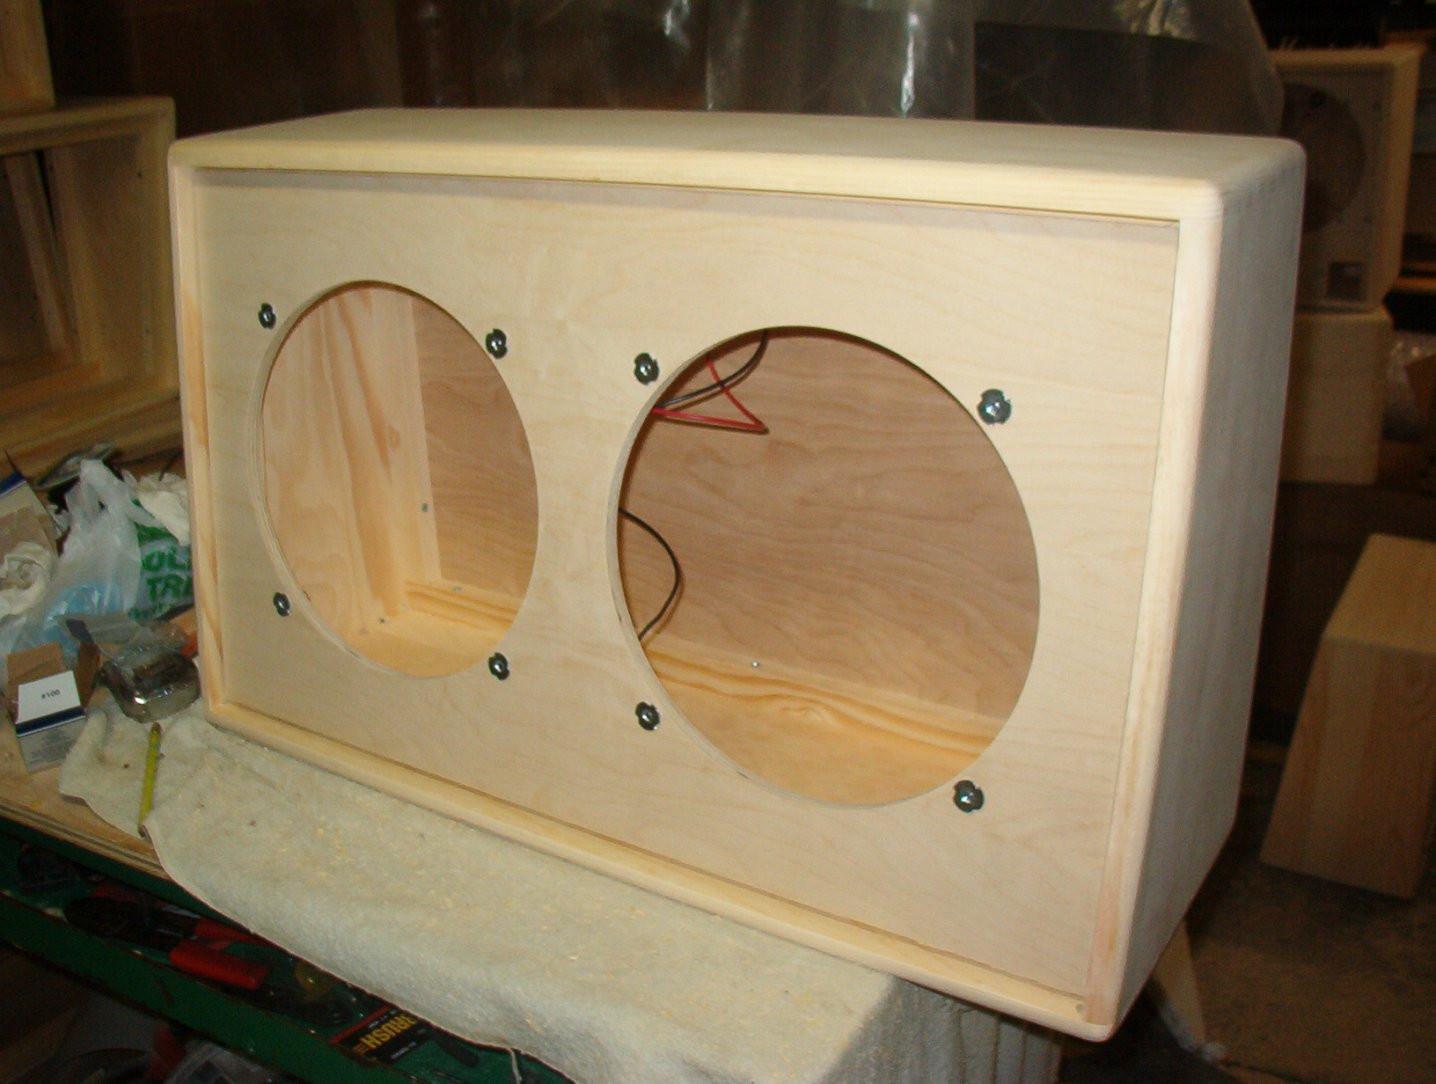 Best ideas about DIY Guitar Speaker Cabinet . Save or Pin Diy Guitar Speaker Cabinet Kits Now.